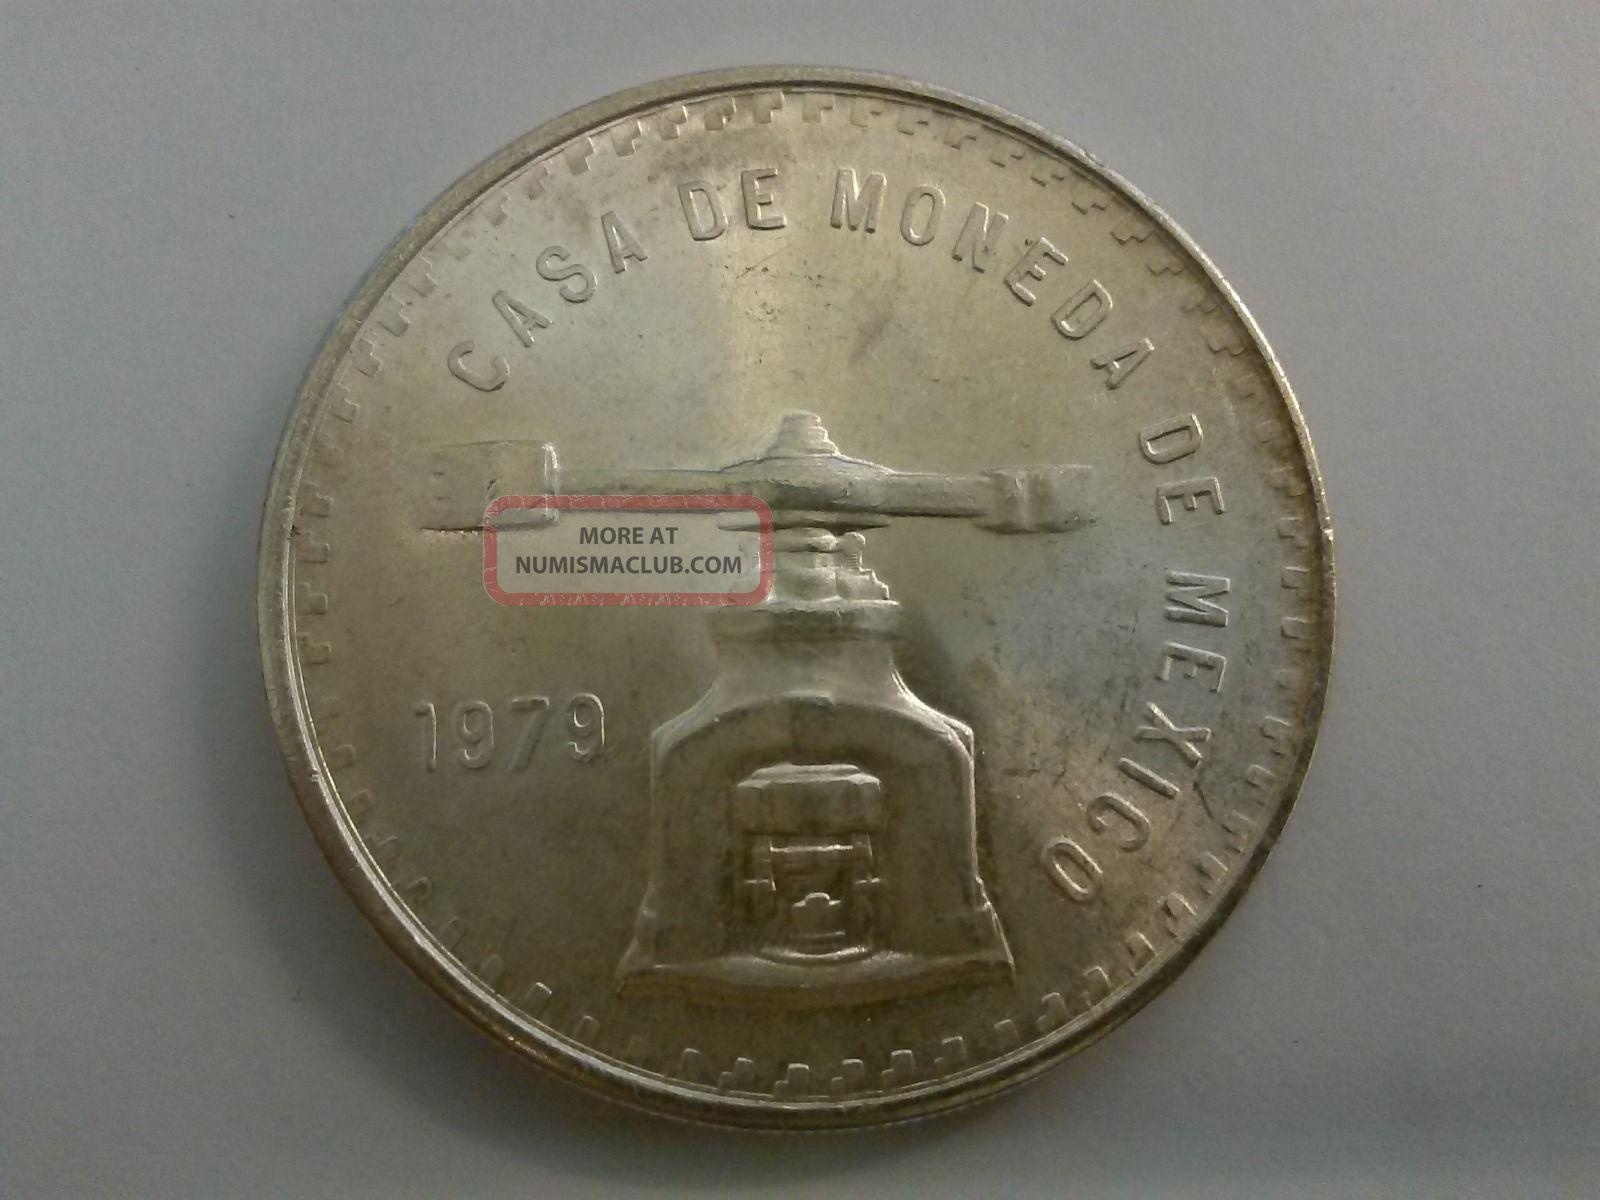 1979 Casa De Moneda De Mexico One Troy Ounce Sterling